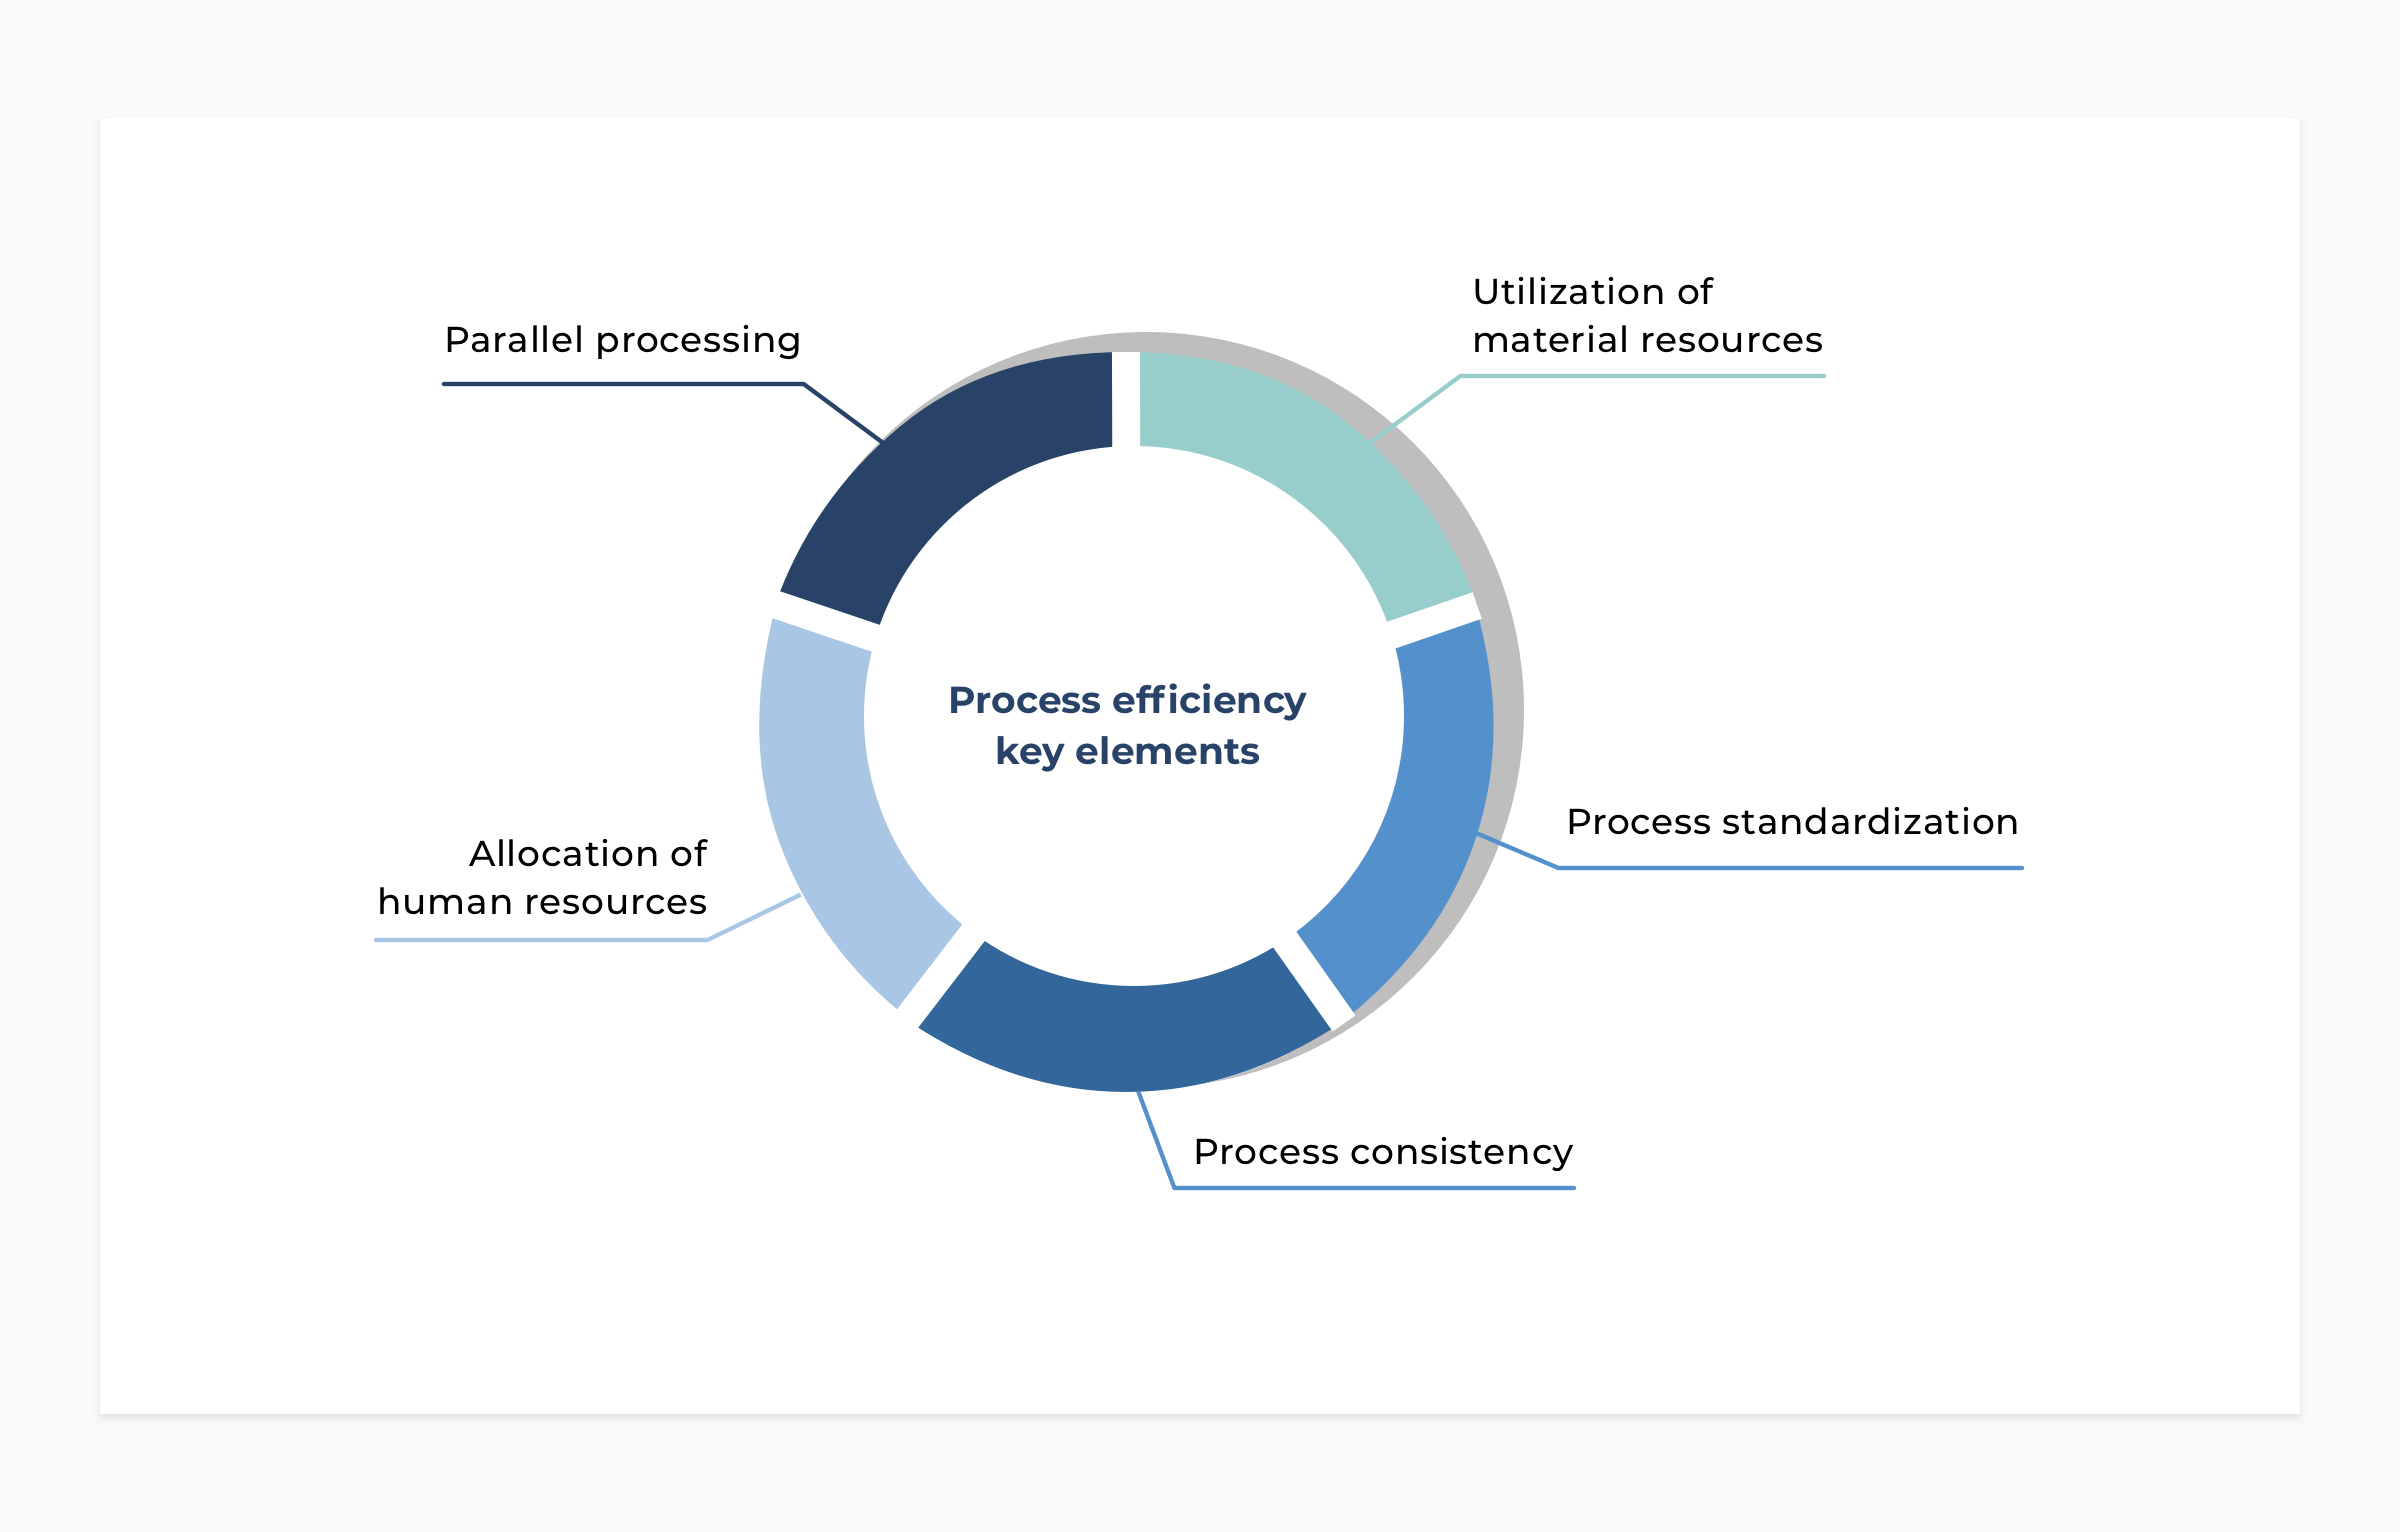 OR process efficiency key elements